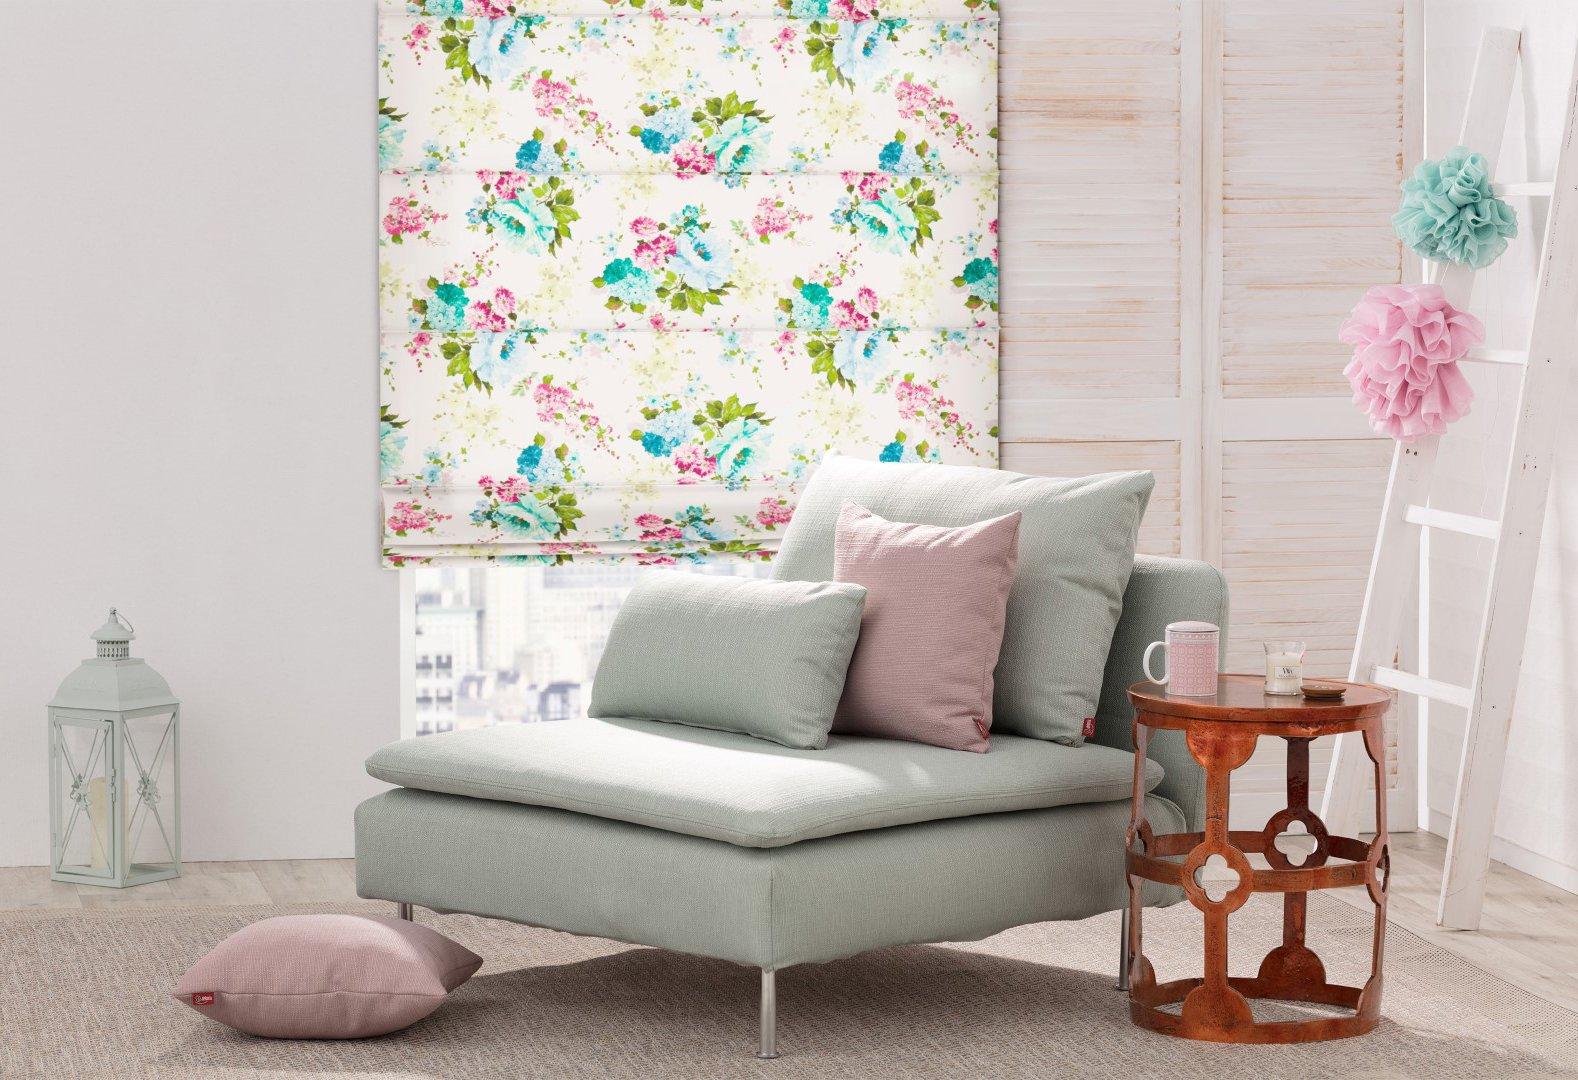 Salon- kwiaty i pastele